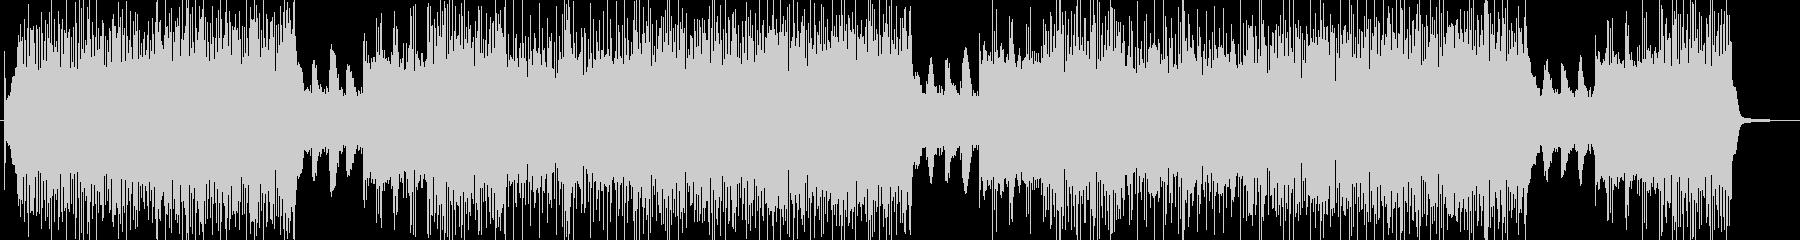 「HR/HM」「ROCK」BGM203の未再生の波形